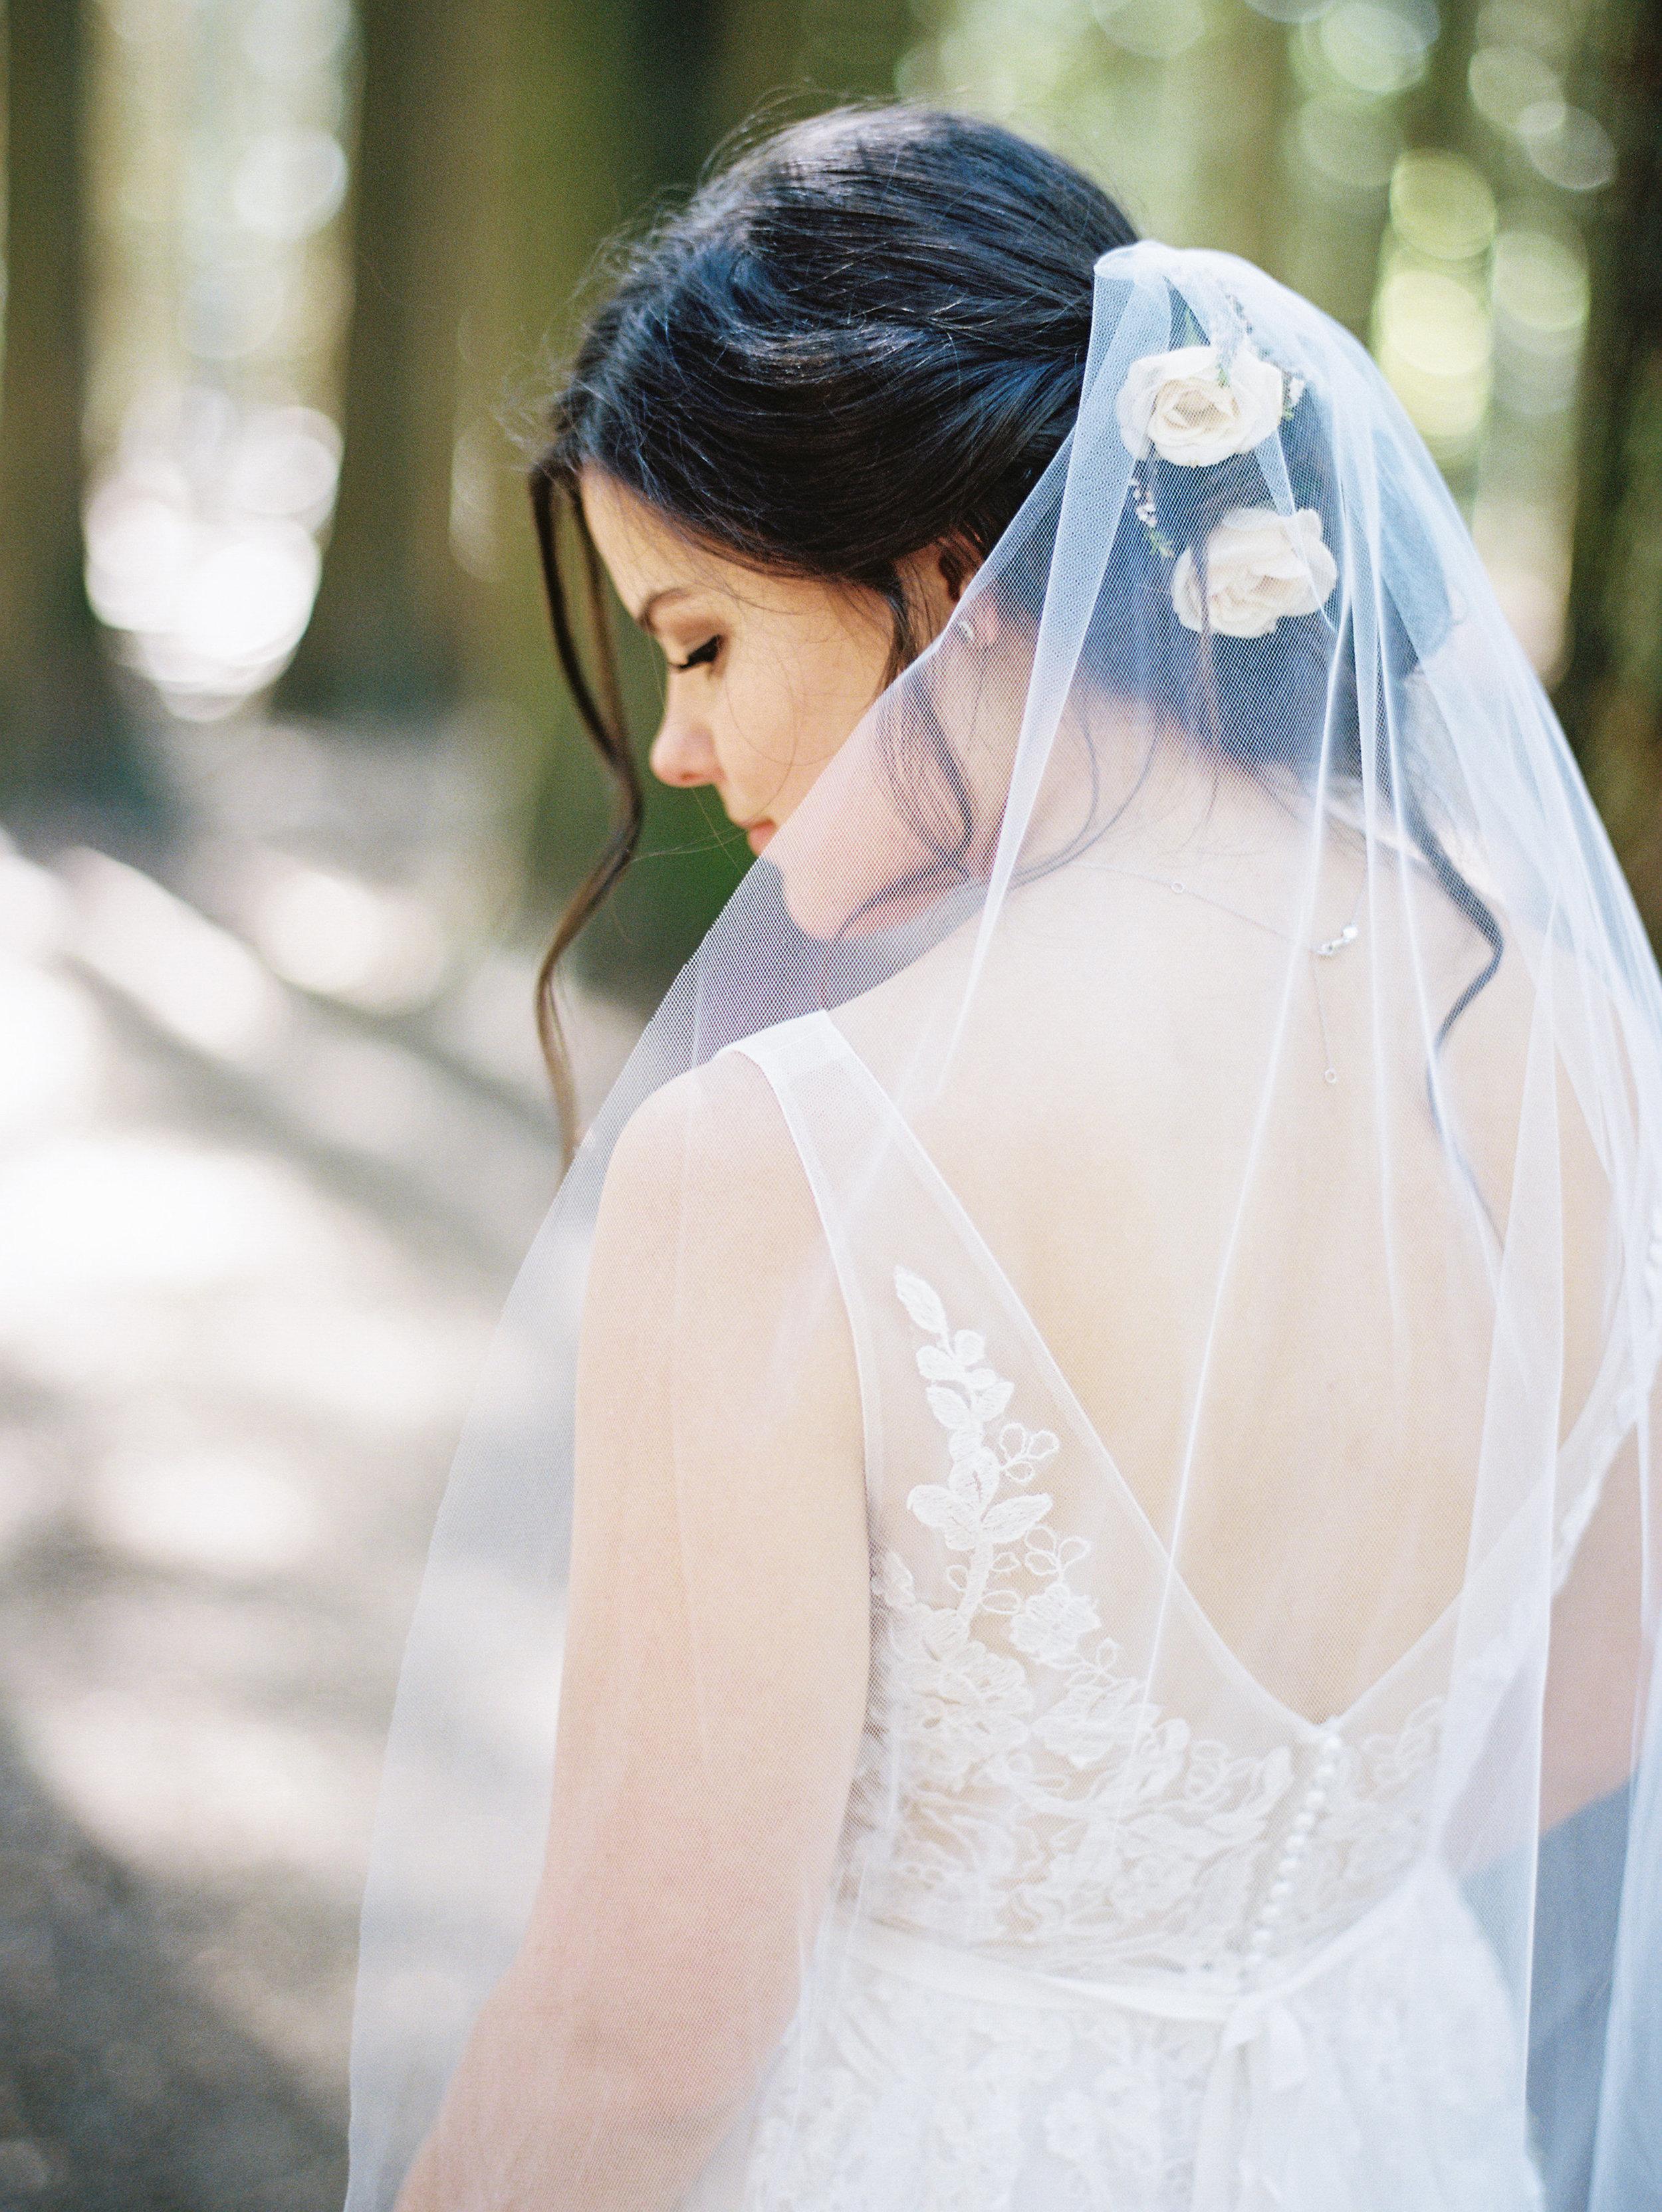 Idaho-Field-Forest-Wedding-Film-Photographer-Kristina-Adams-177.jpg